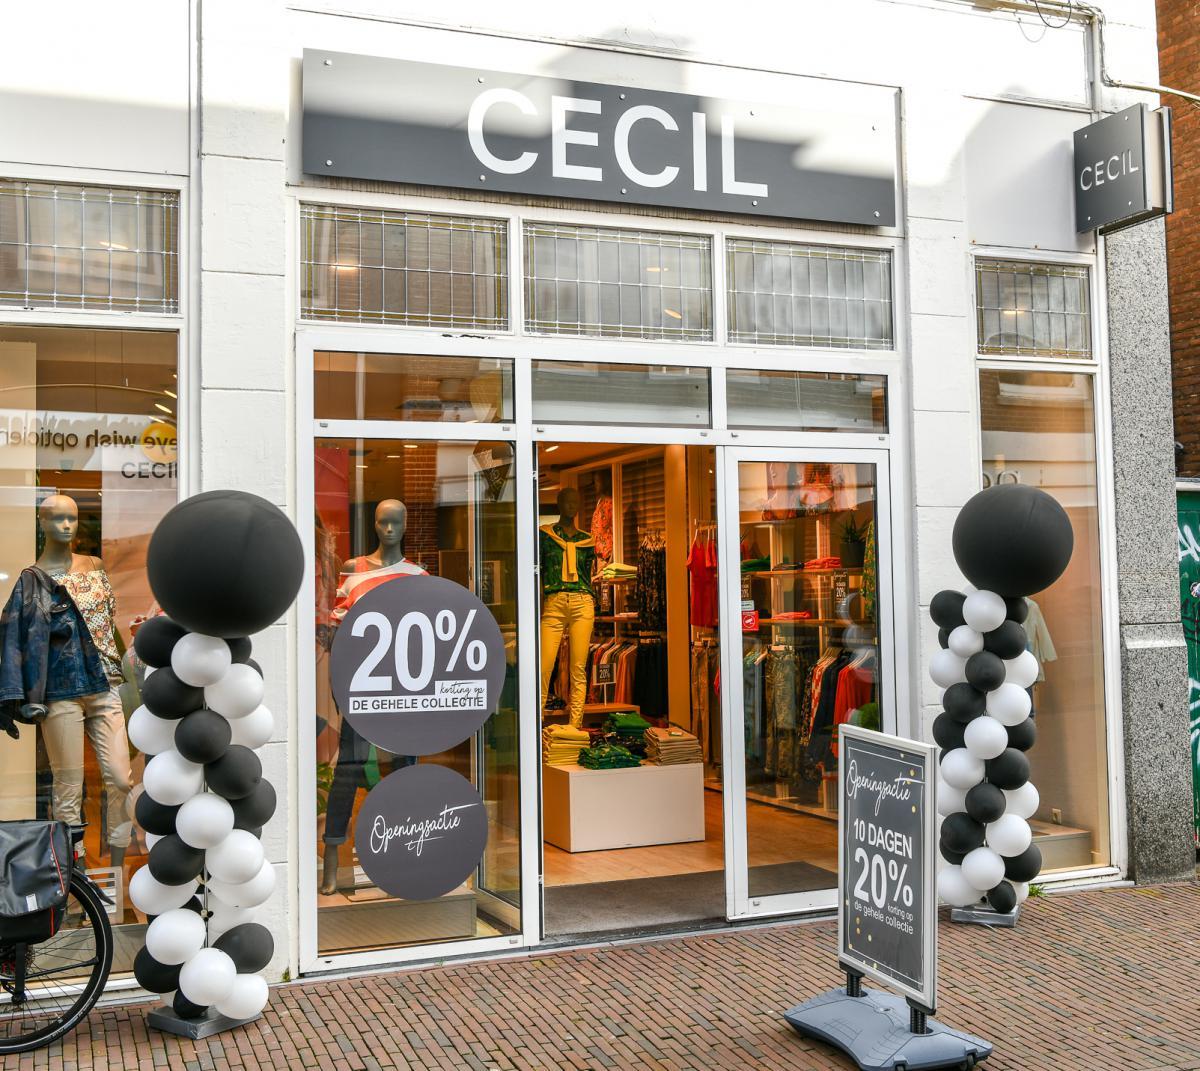 Cecil | winkeltjes  | Ontdek Meppel | Weet wat er speelt.